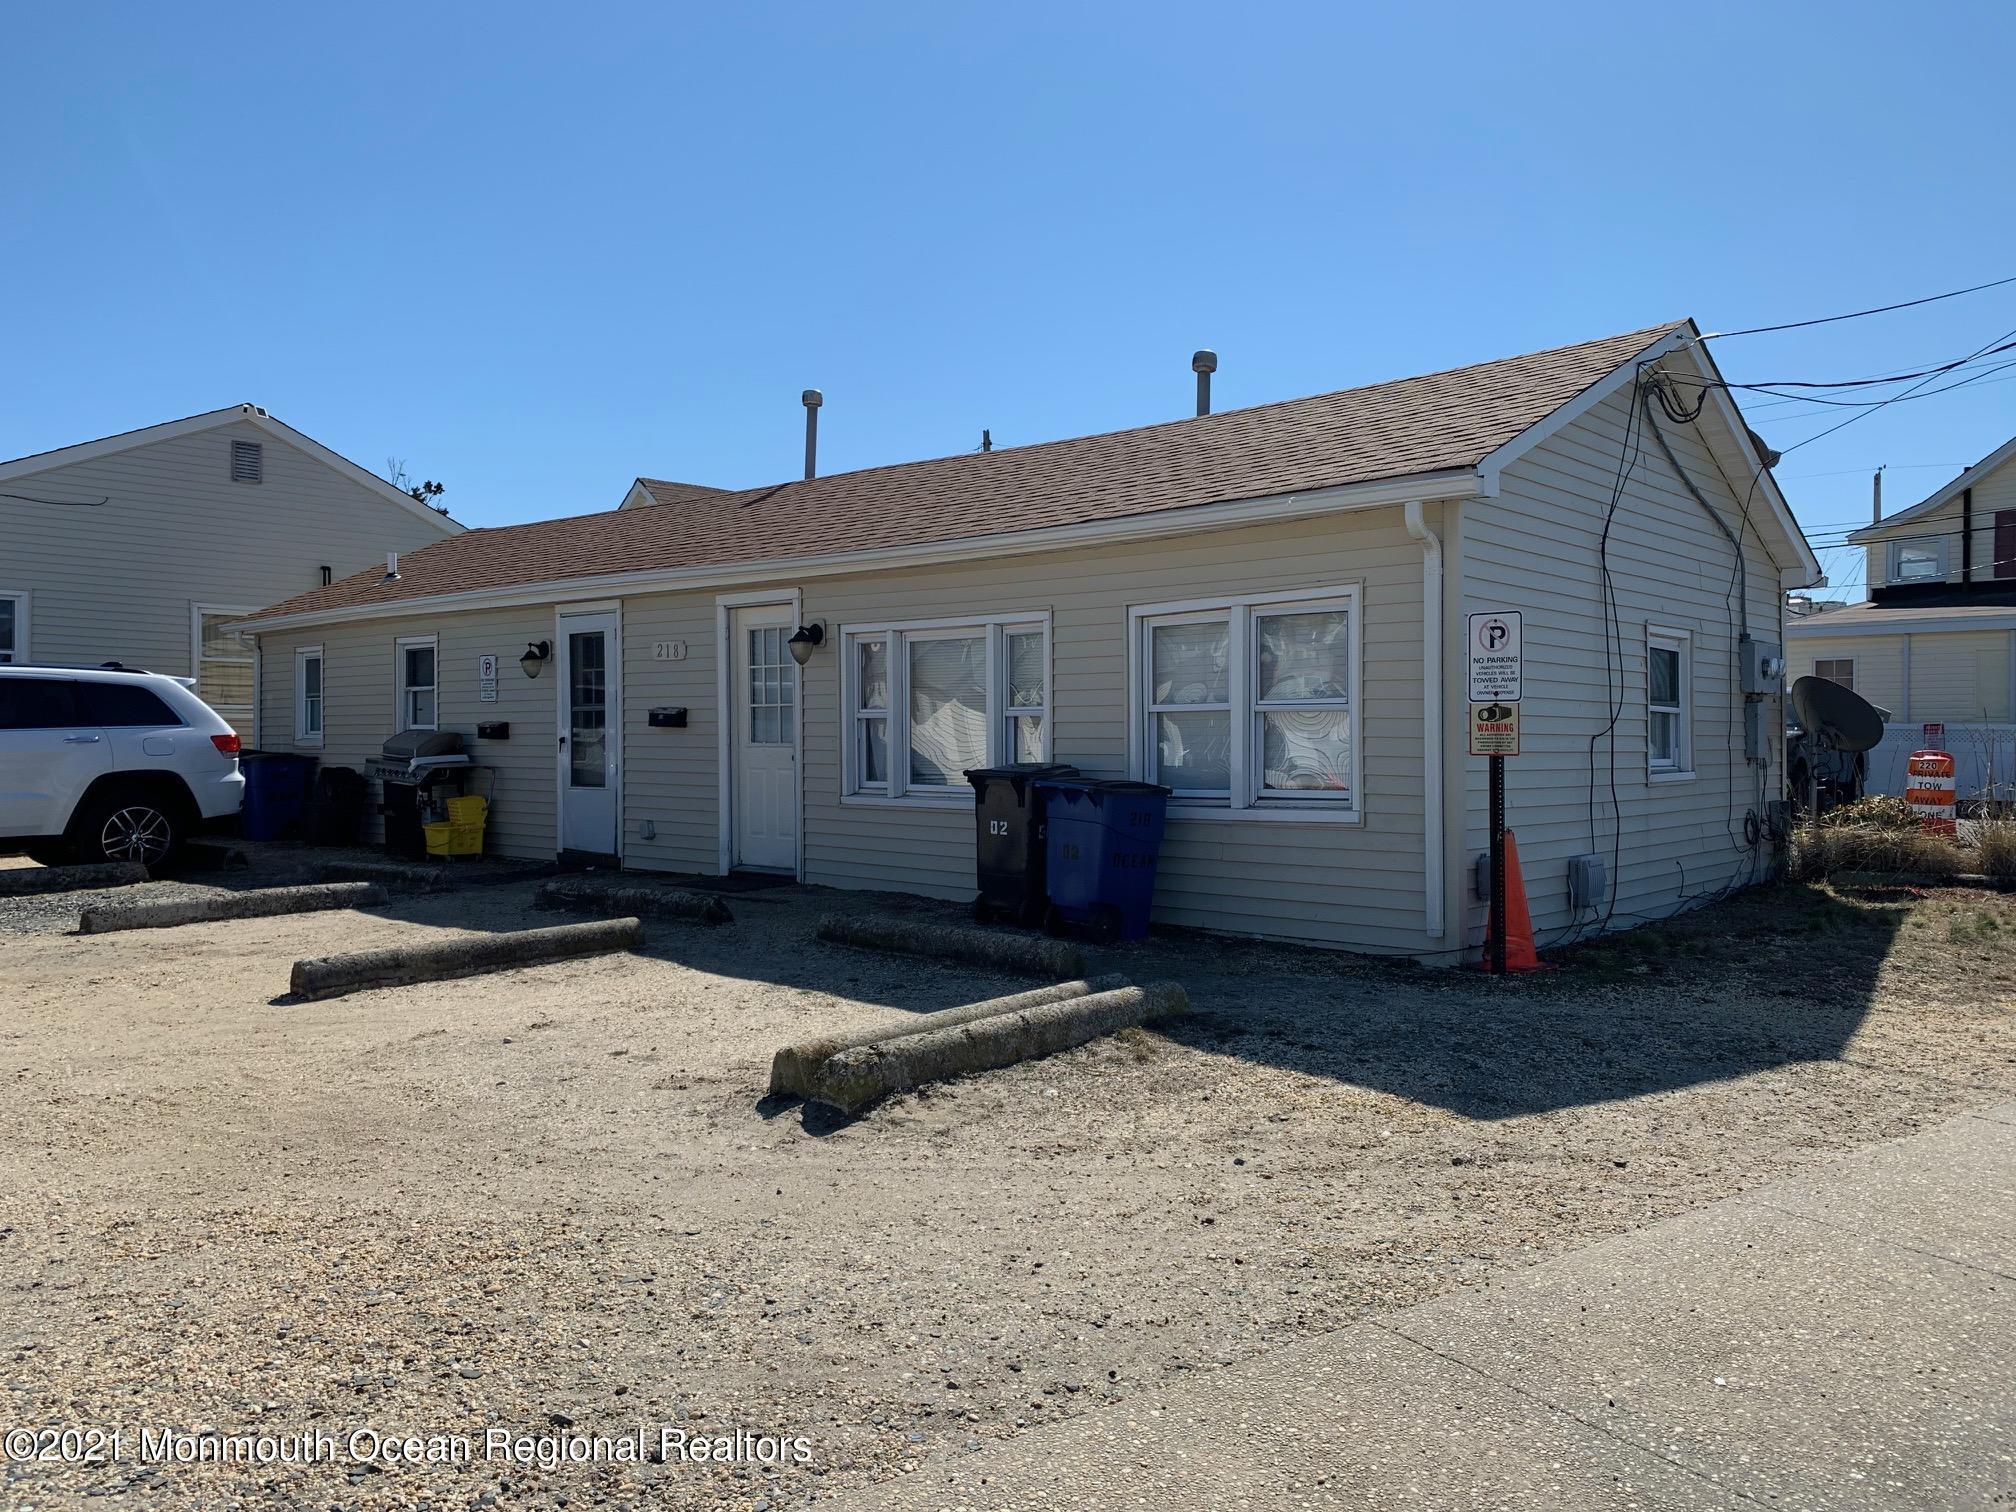 218 Ocean Avenue, Point Pleasant Beach, New Jersey 08742, 4 Bedrooms Bedrooms, ,2 BathroomsBathrooms,Multifamily,For Sale,218 Ocean Avenue,1,22107447